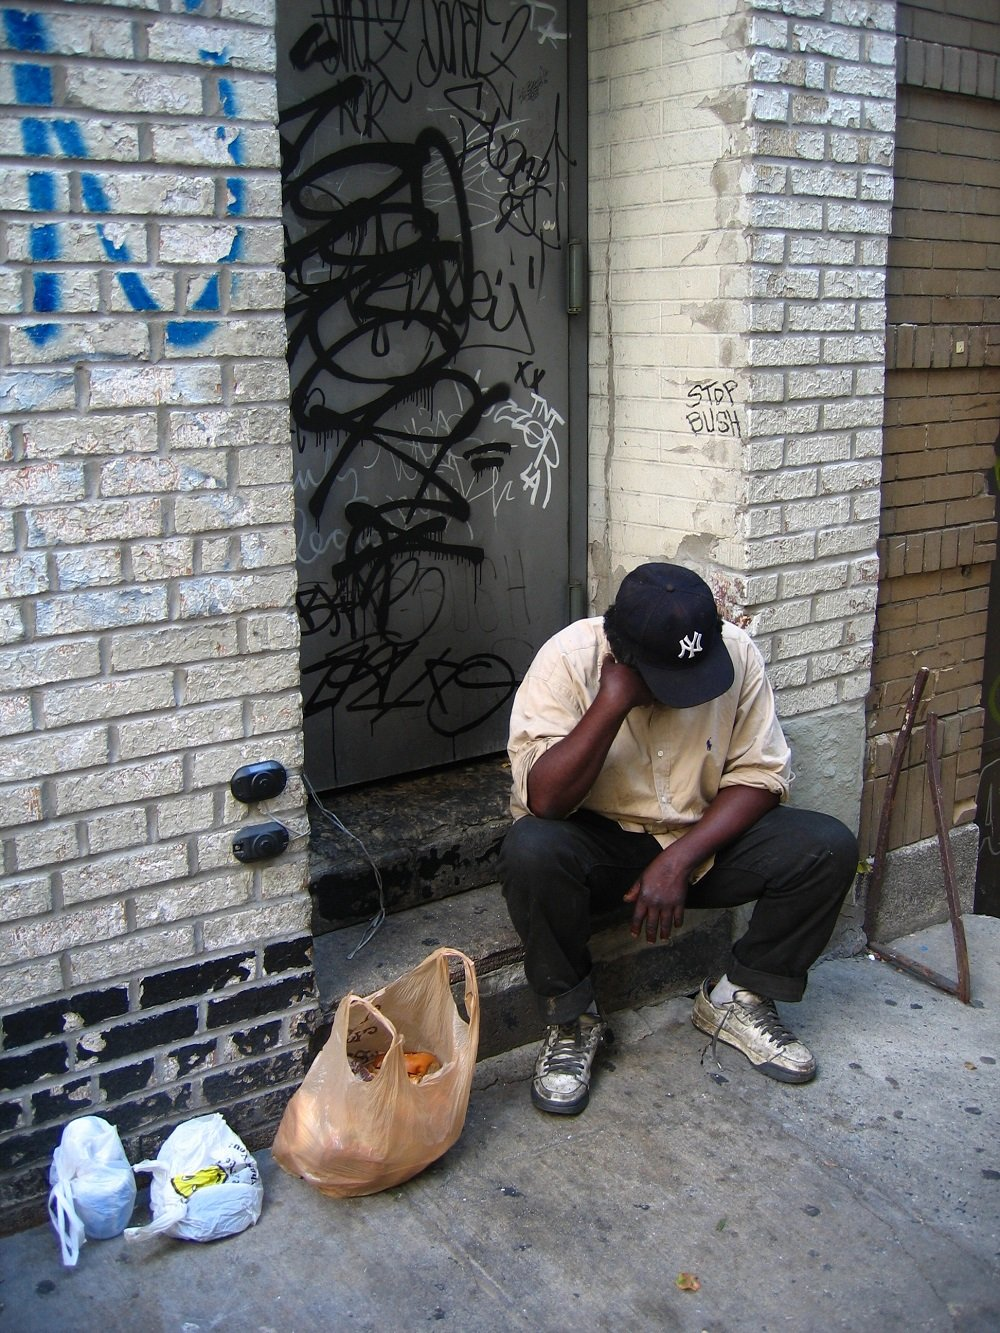 Hombre sin hogar. | Imagen: Wikimedia Commons